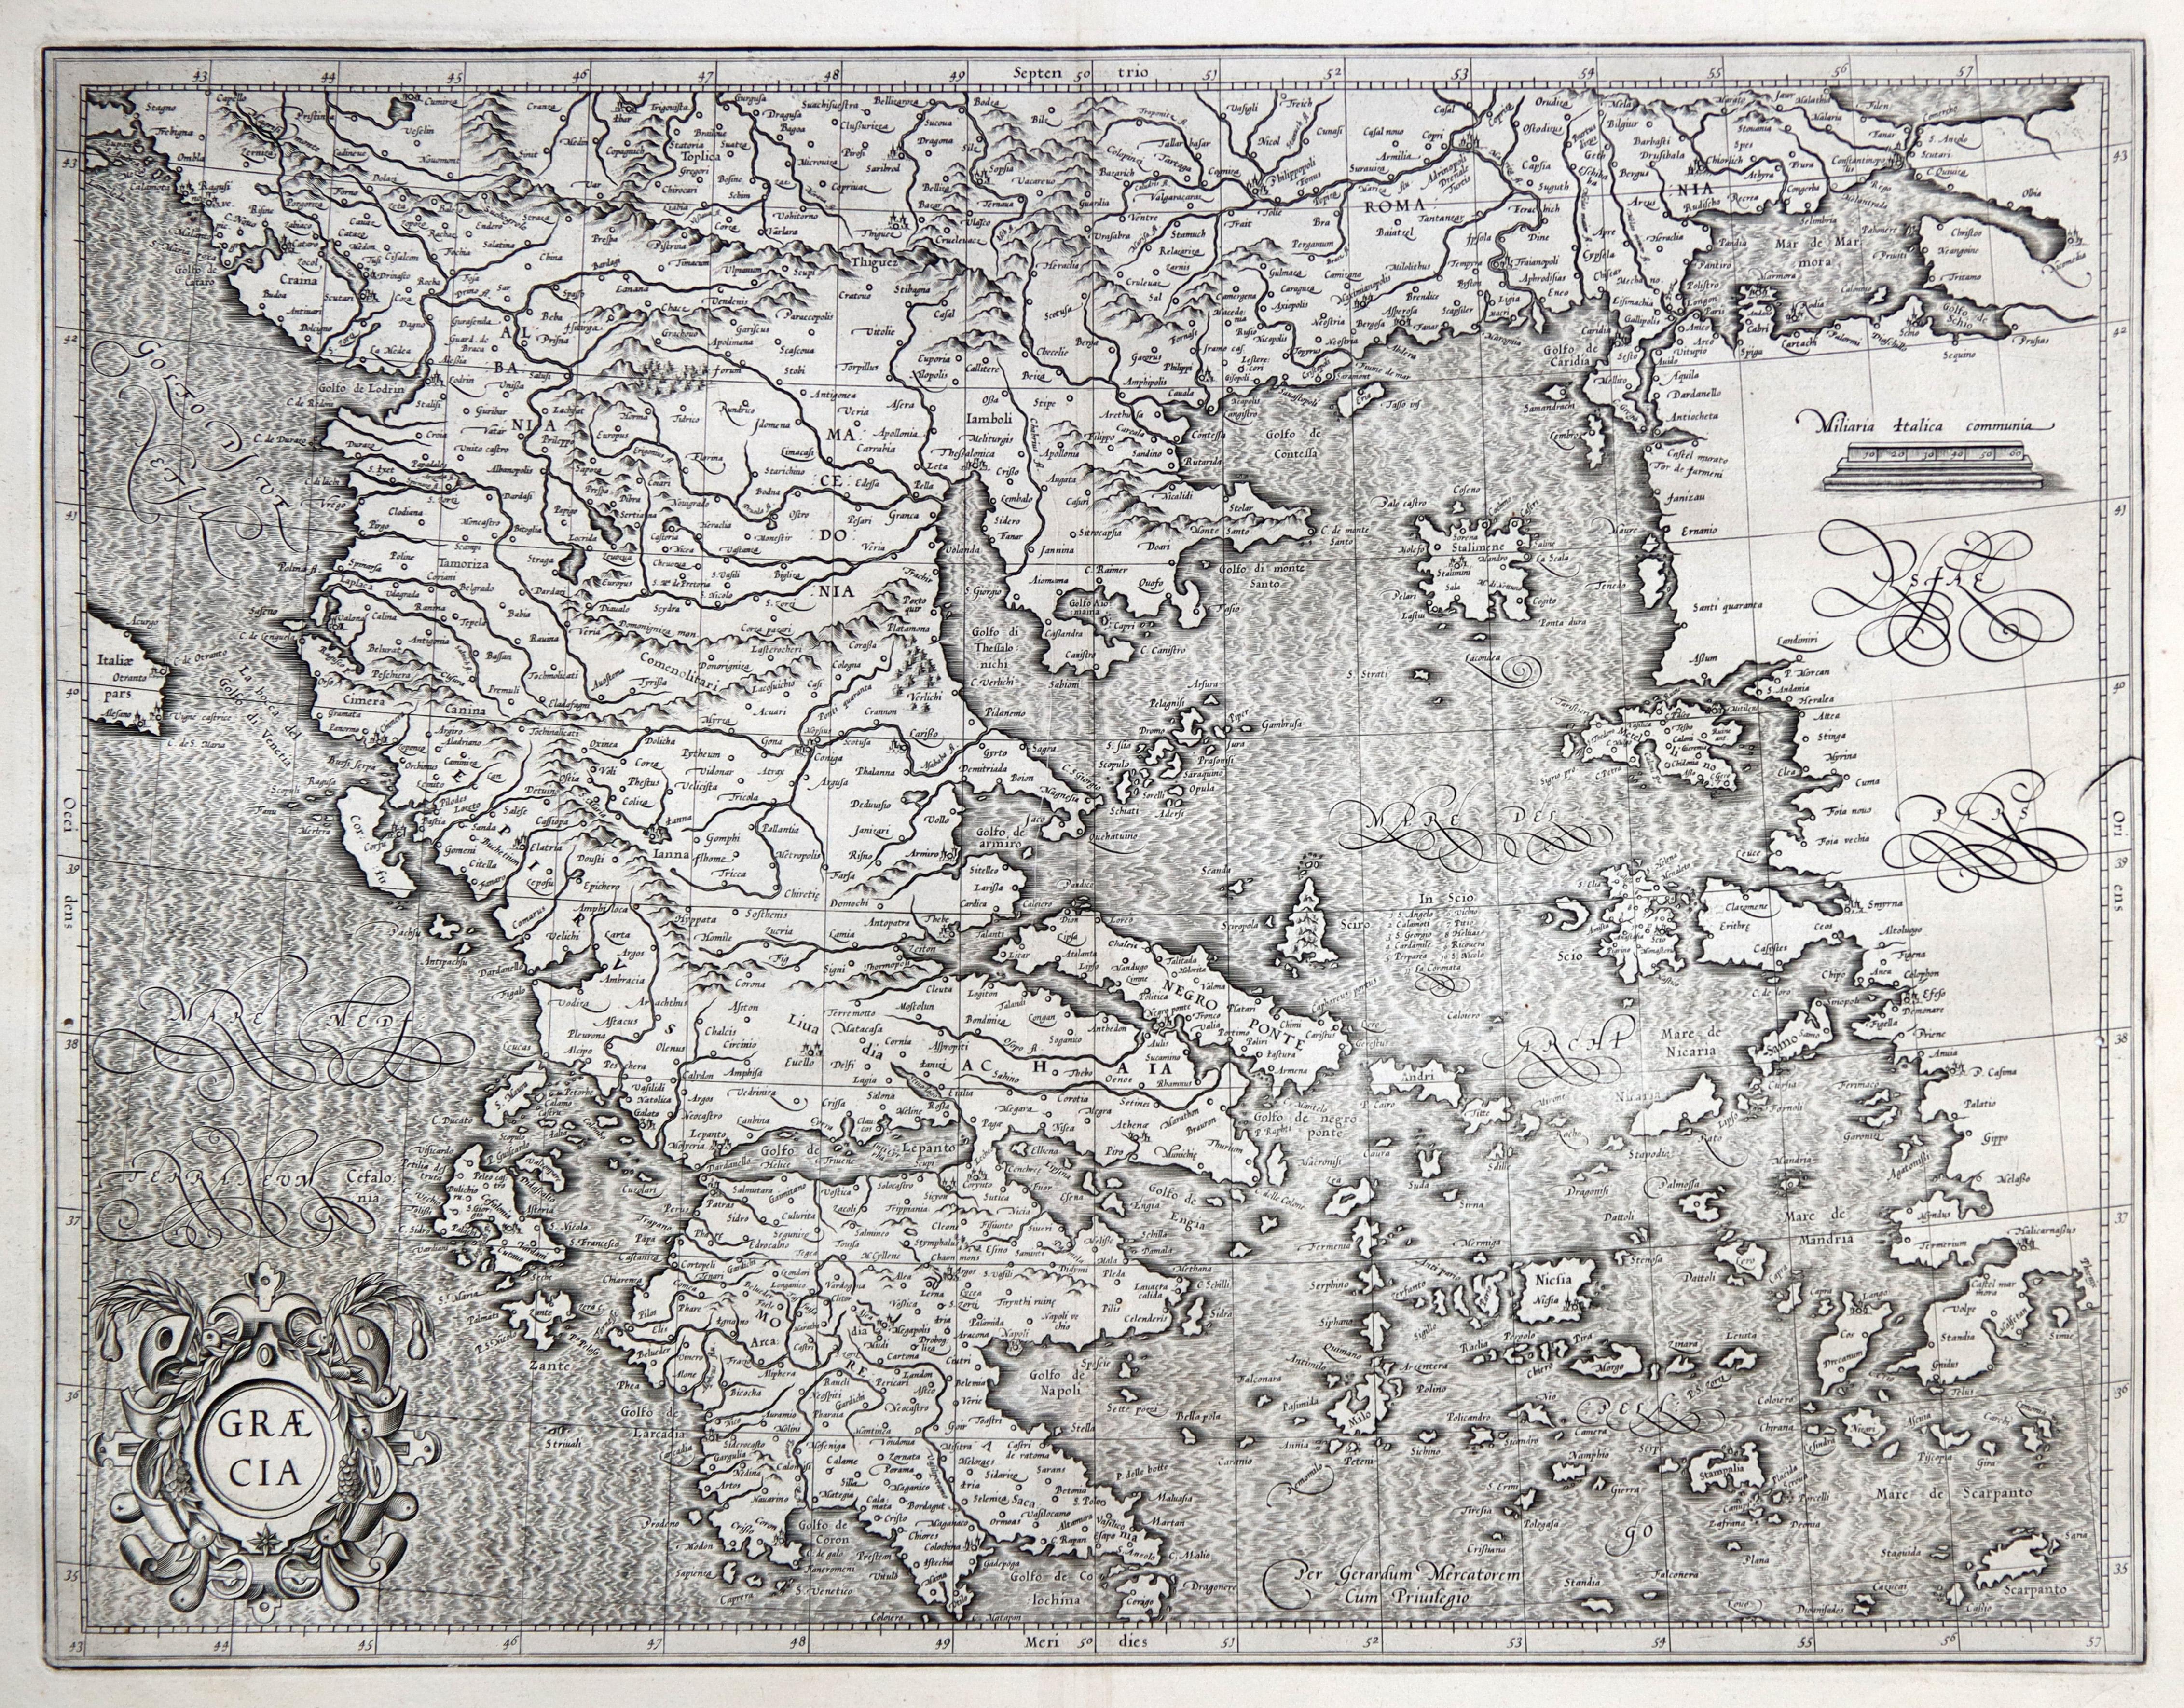 Kst.- Karte, n. G. Mercator b. H.: Griechenland ( Greece